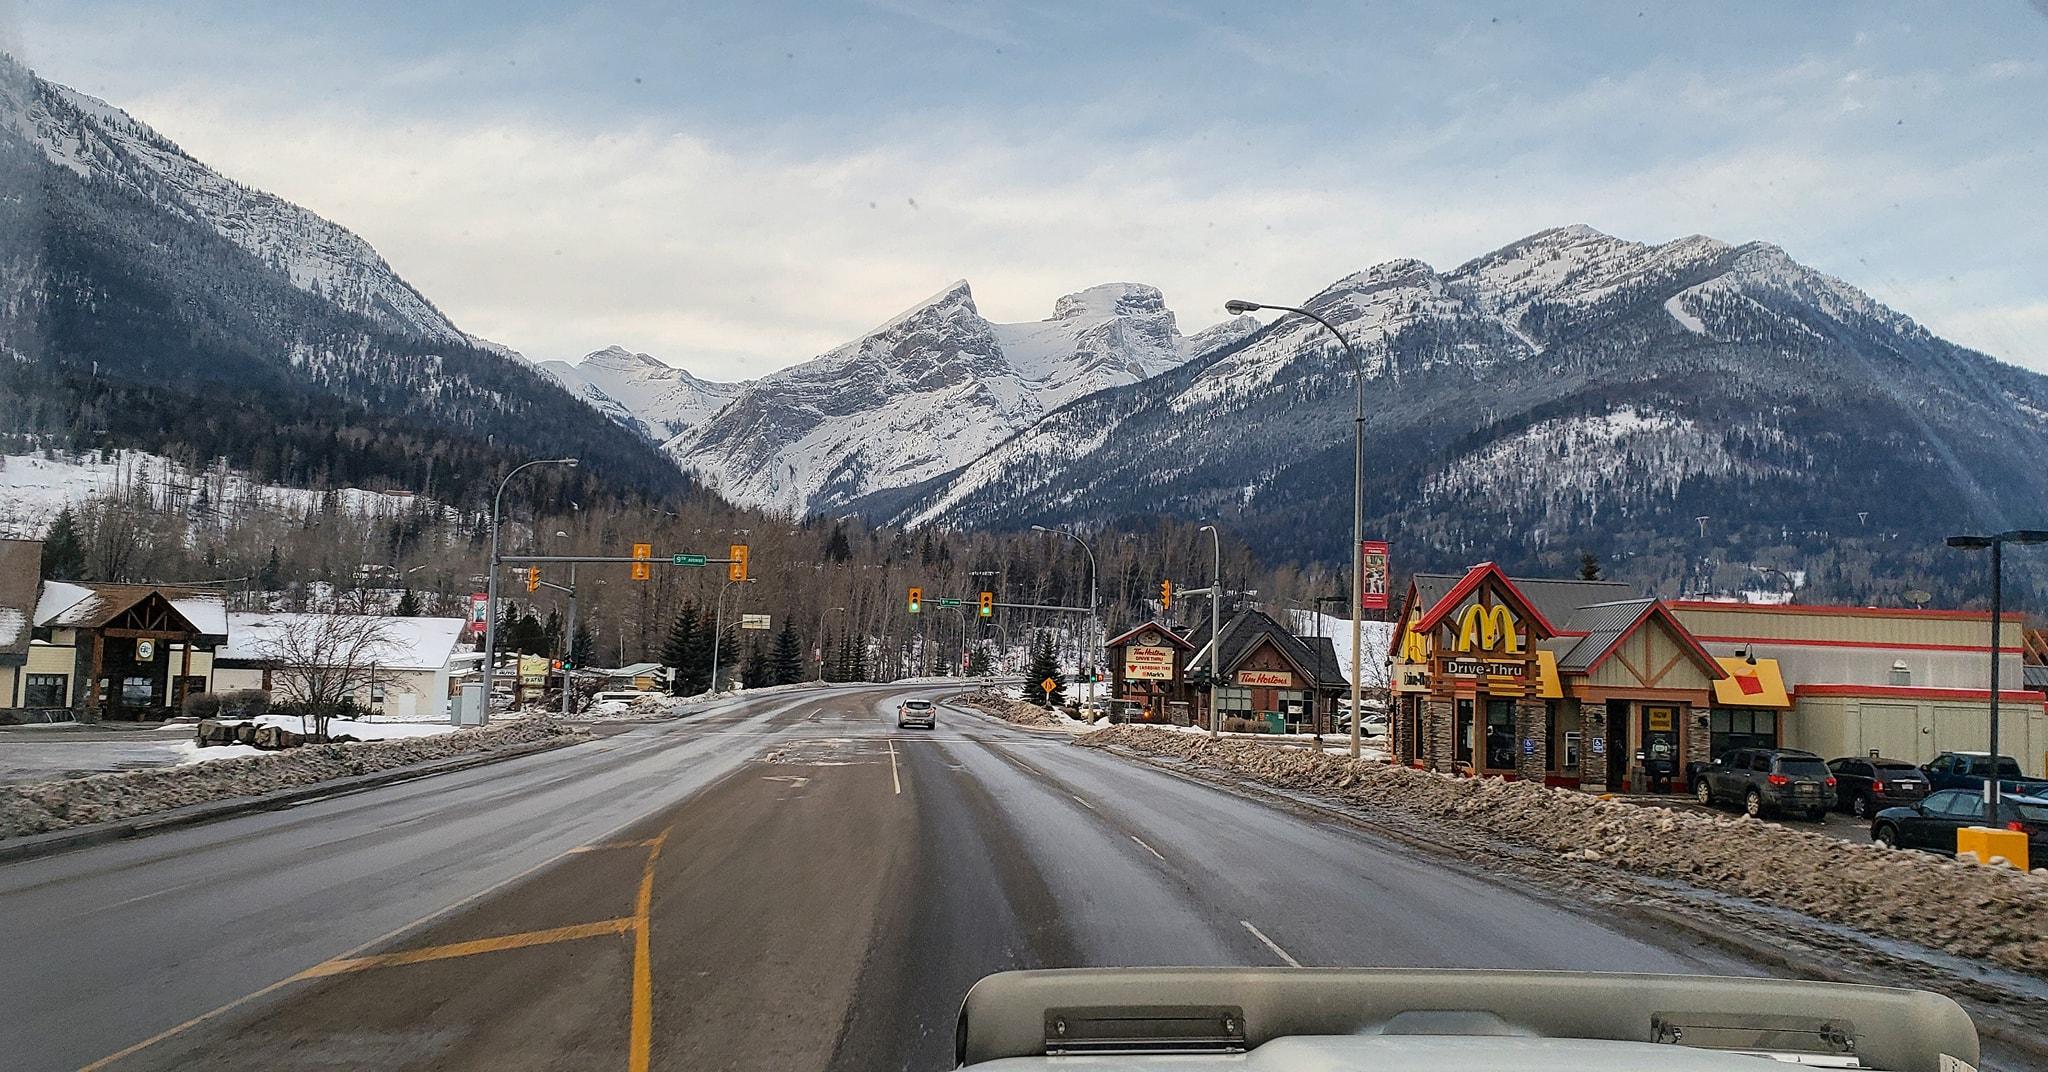 6-1-2019-rondreis-van-2800-km-Montana-Idaho-Oregon-Washington-(11)